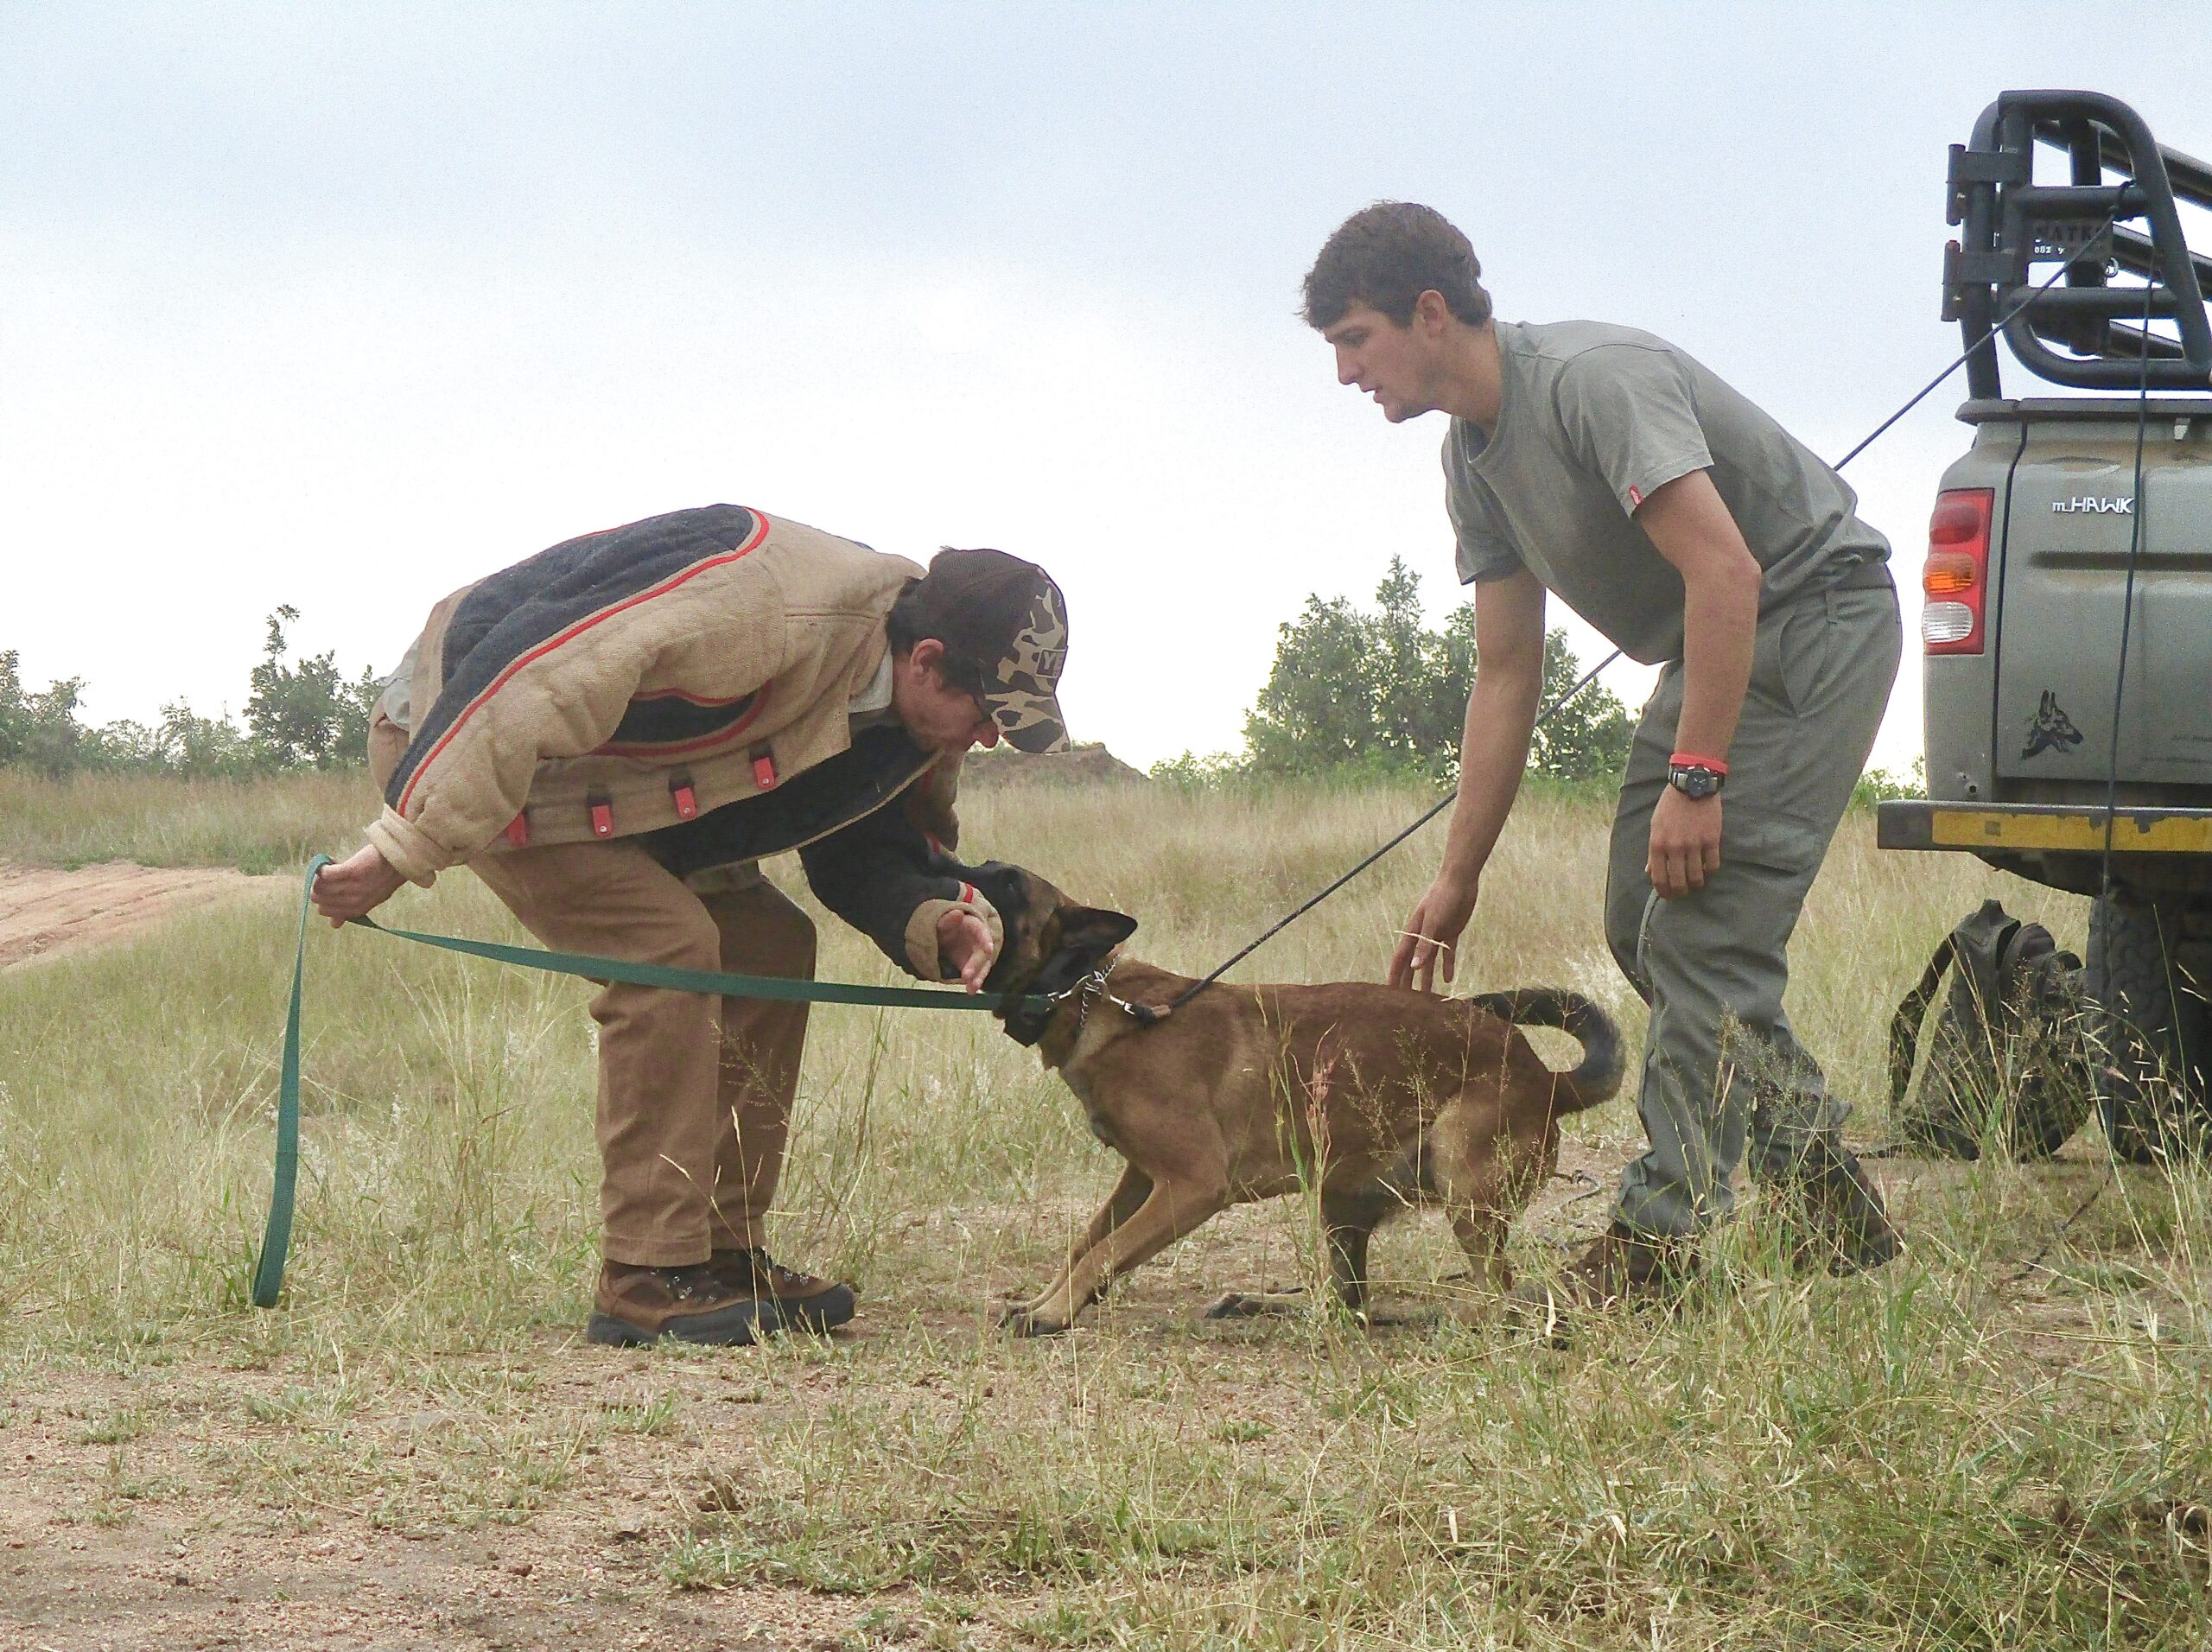 Malinois bite work south africa